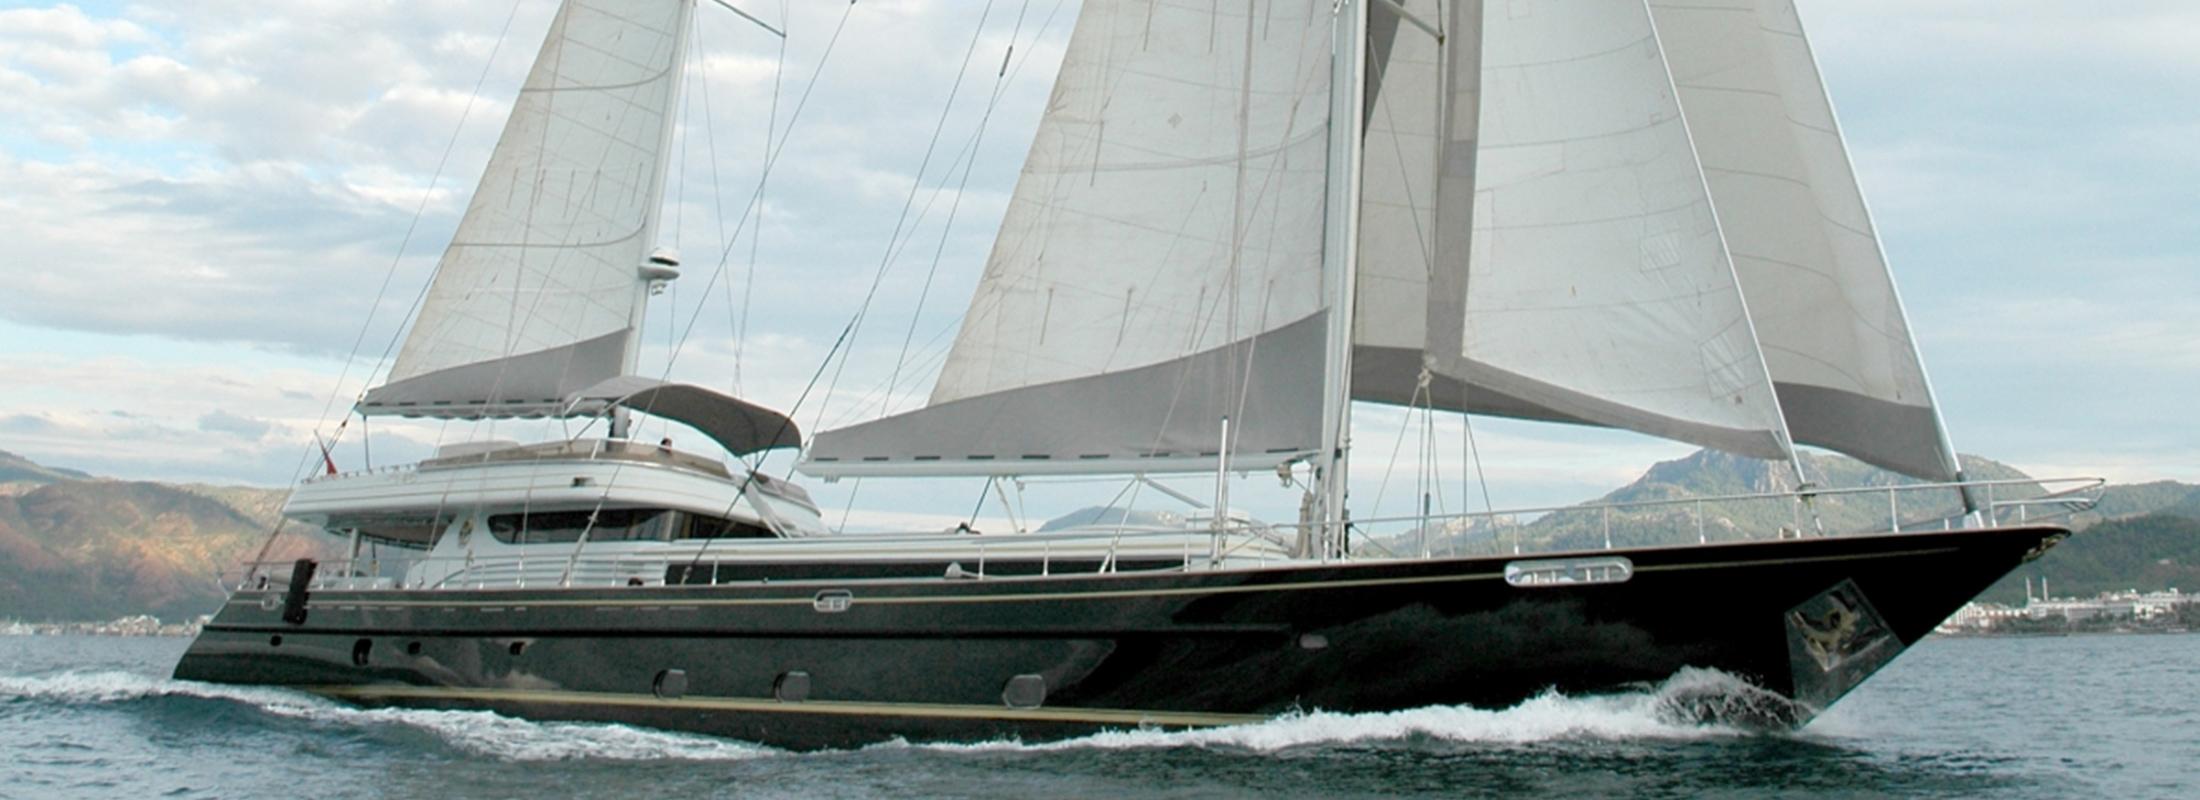 Suheyla Sultan Sailing Yacht For Charter